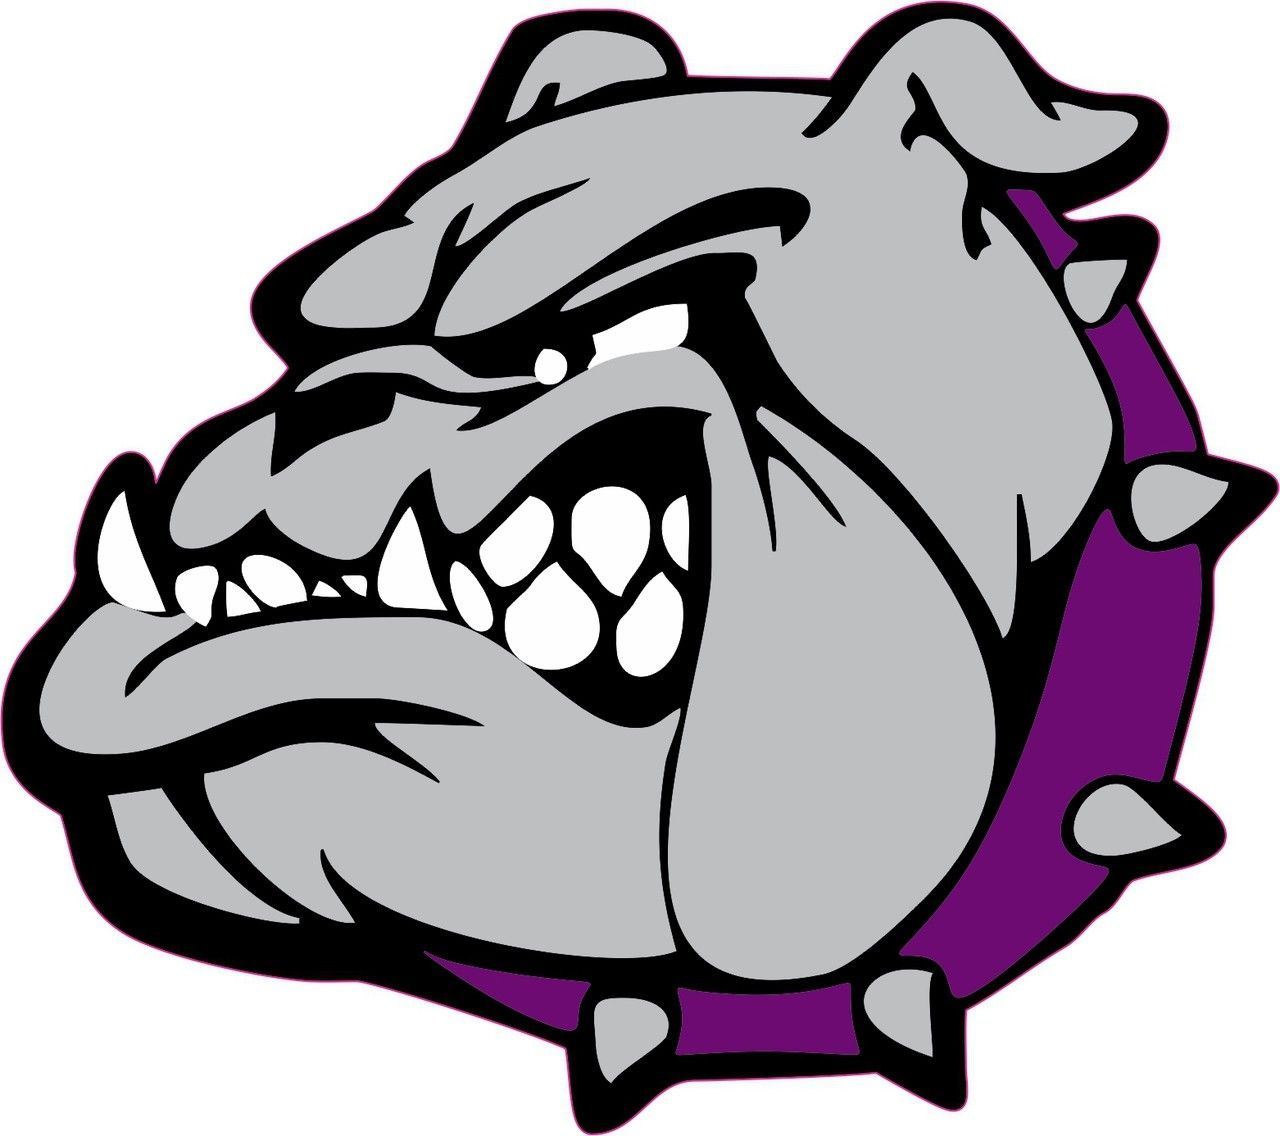 Bumper sticker design tips - 5in X 5in Purple Collar Bulldog Mascot Mascots Bumper Sticker Vinyl Window Decal